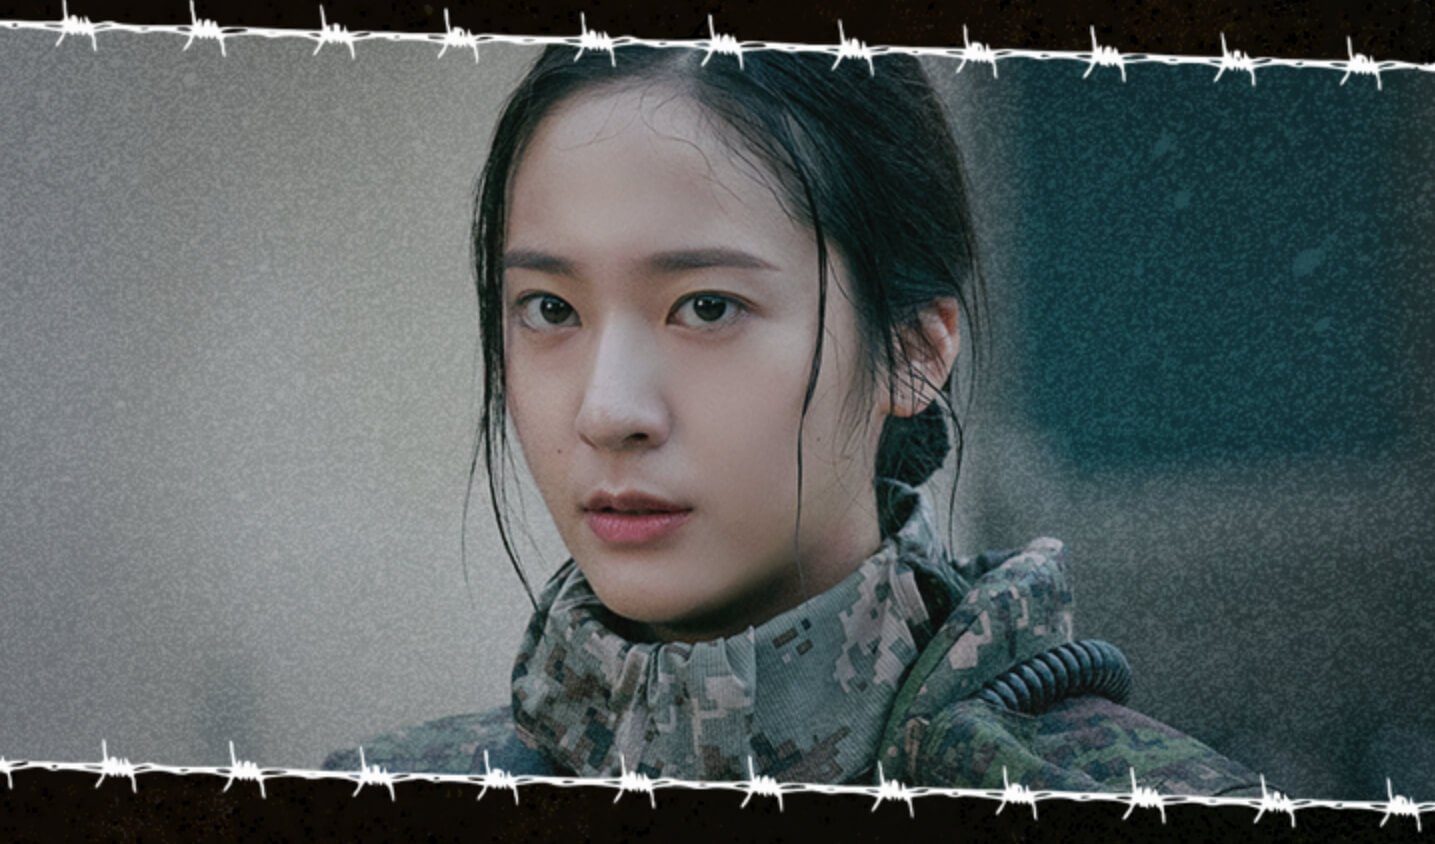 OCN드라마 써치 몇부작, 웹툰, 원작, 작가, 출연진